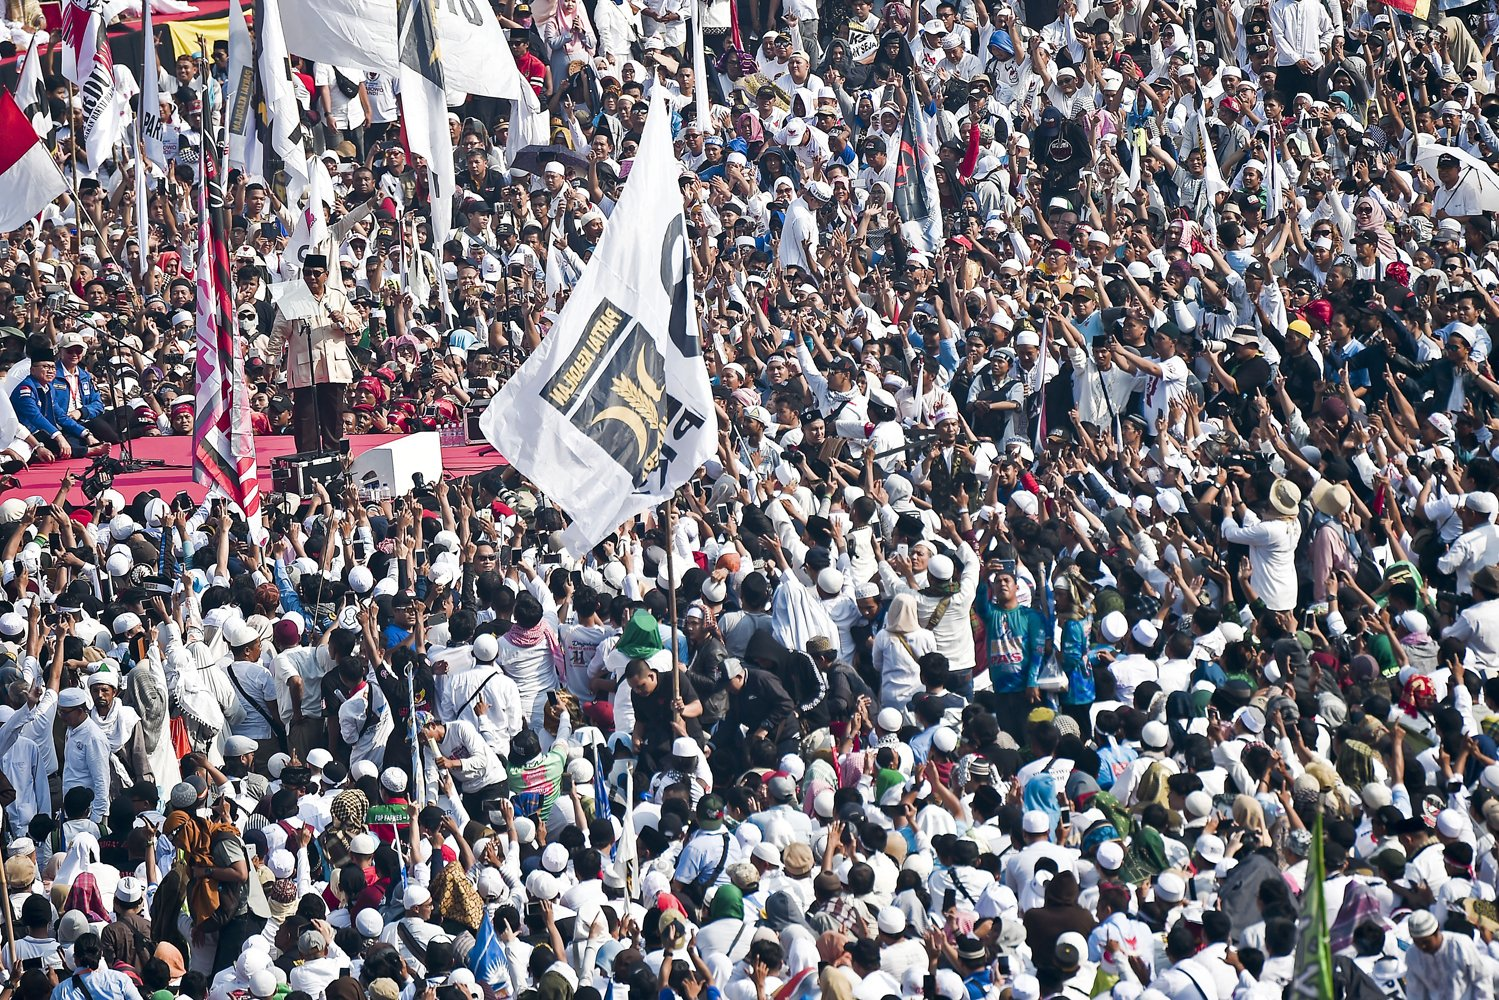 Capres nomor urut 02 Prabowo Subianto menyampaikan orasi politik saat kampanye akbar di Stadion Gelora Bung Karno, Senayan, Jakarta, Minggu (7/4/2019).